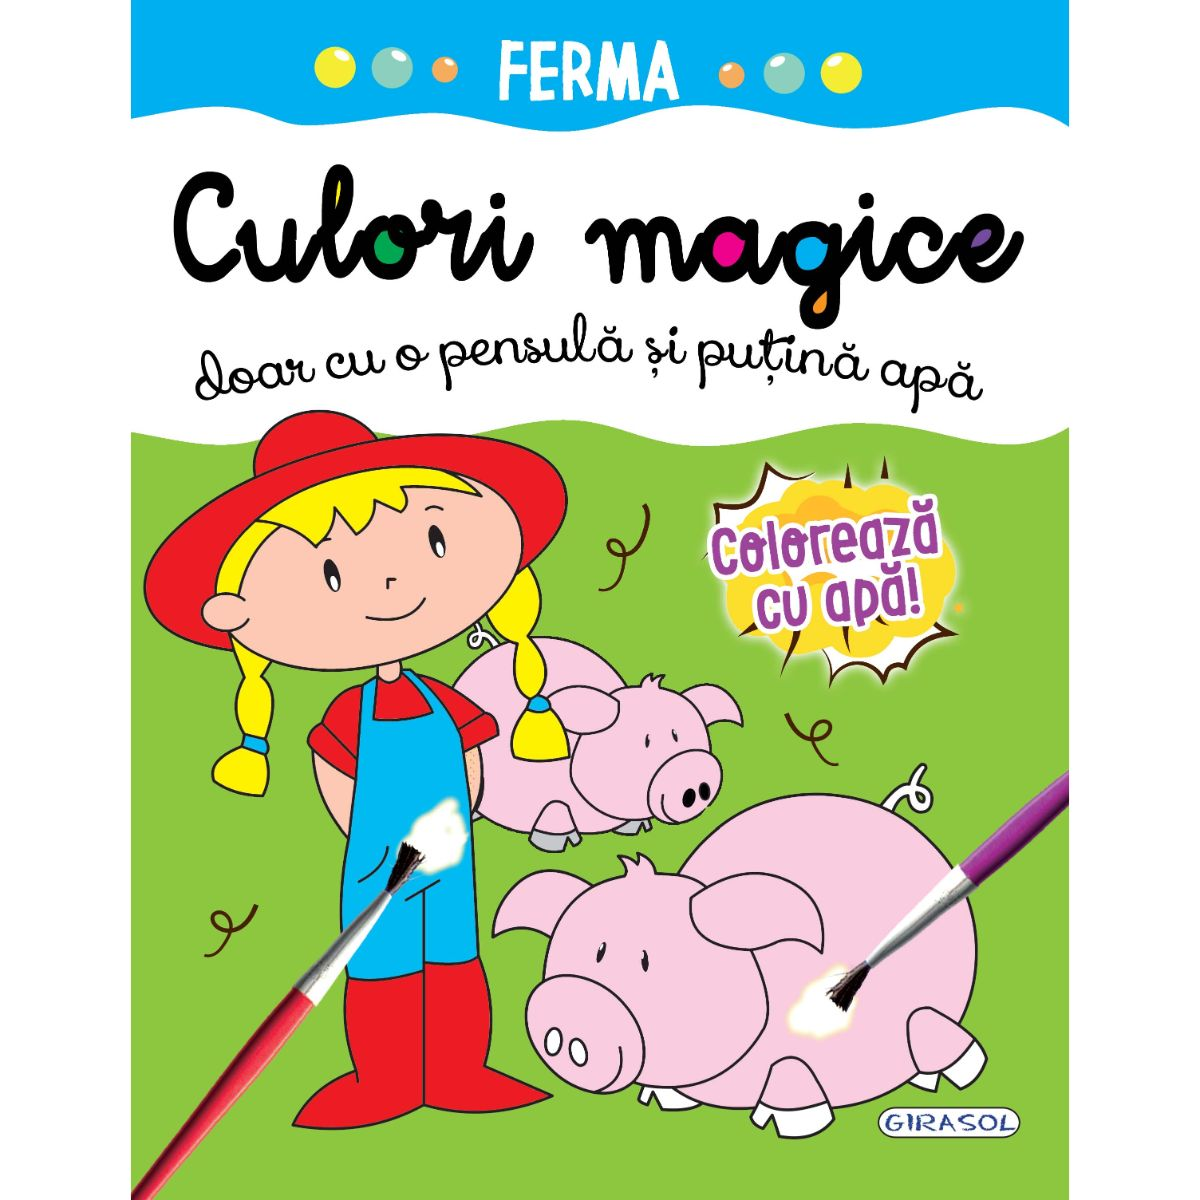 Culori magice - Ferma